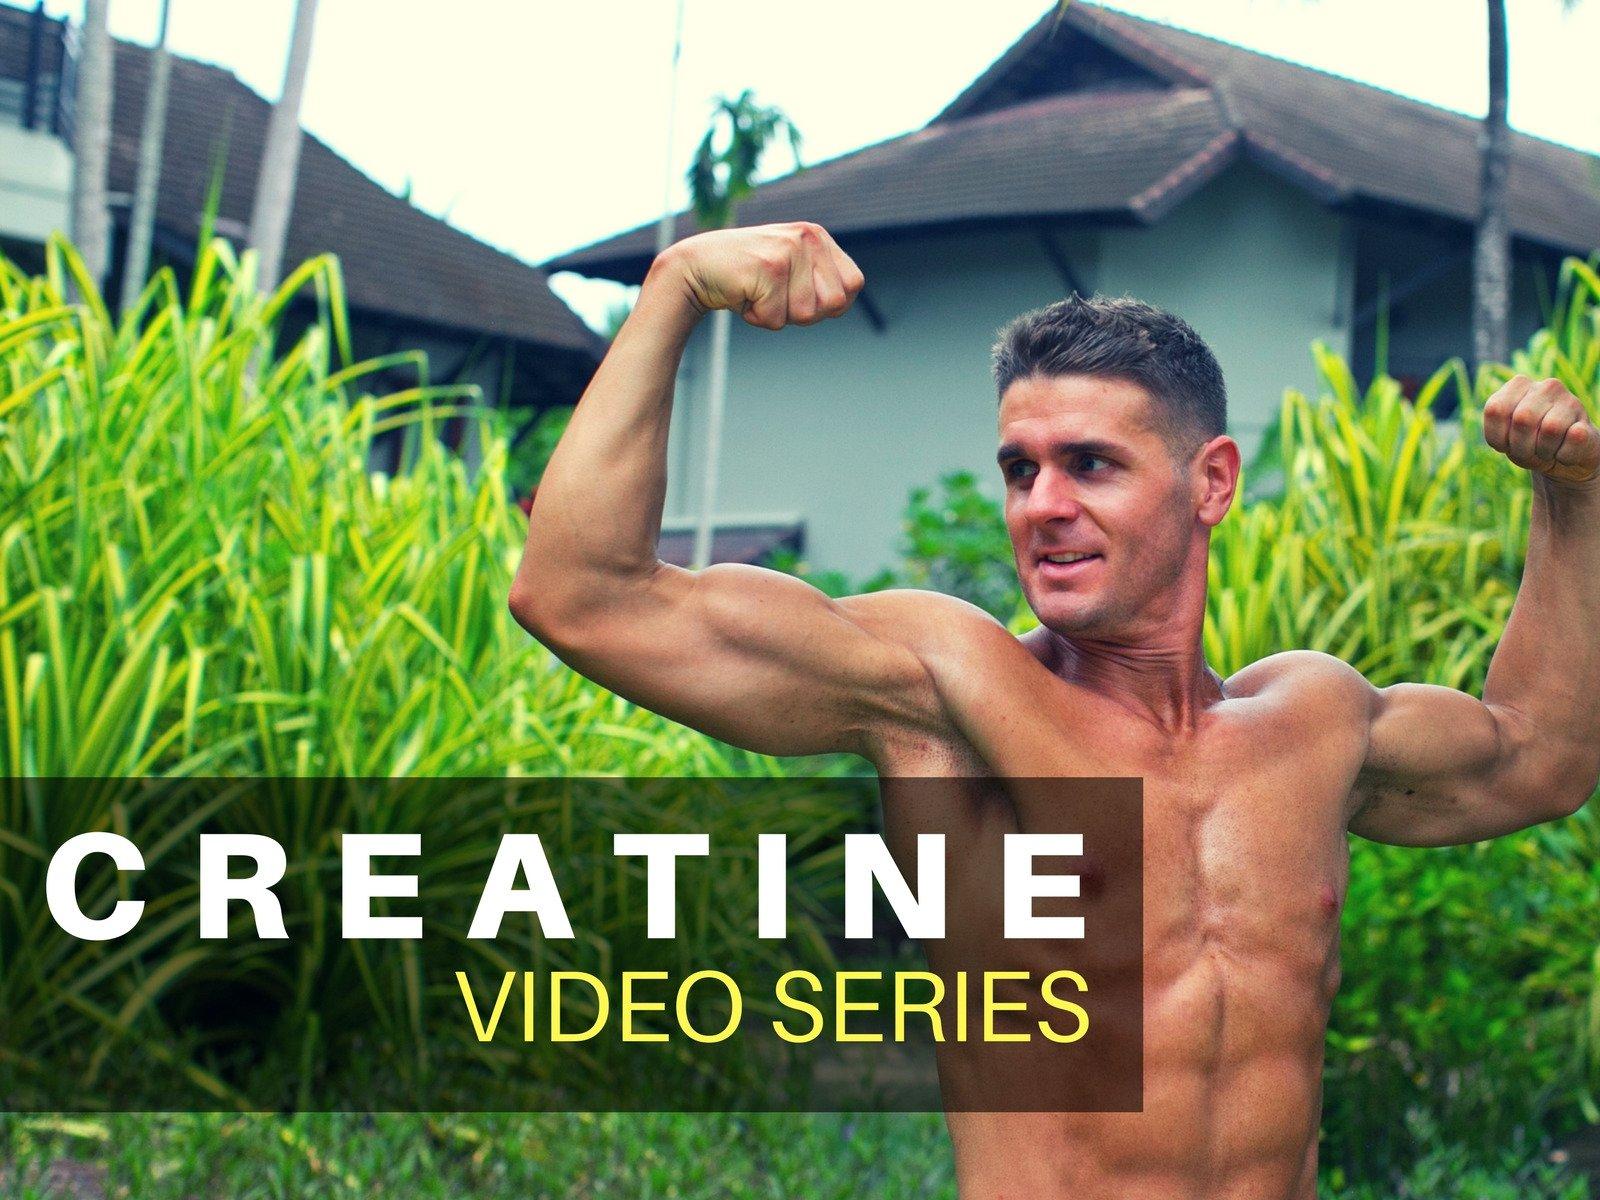 Creatine Video Series - Season 1